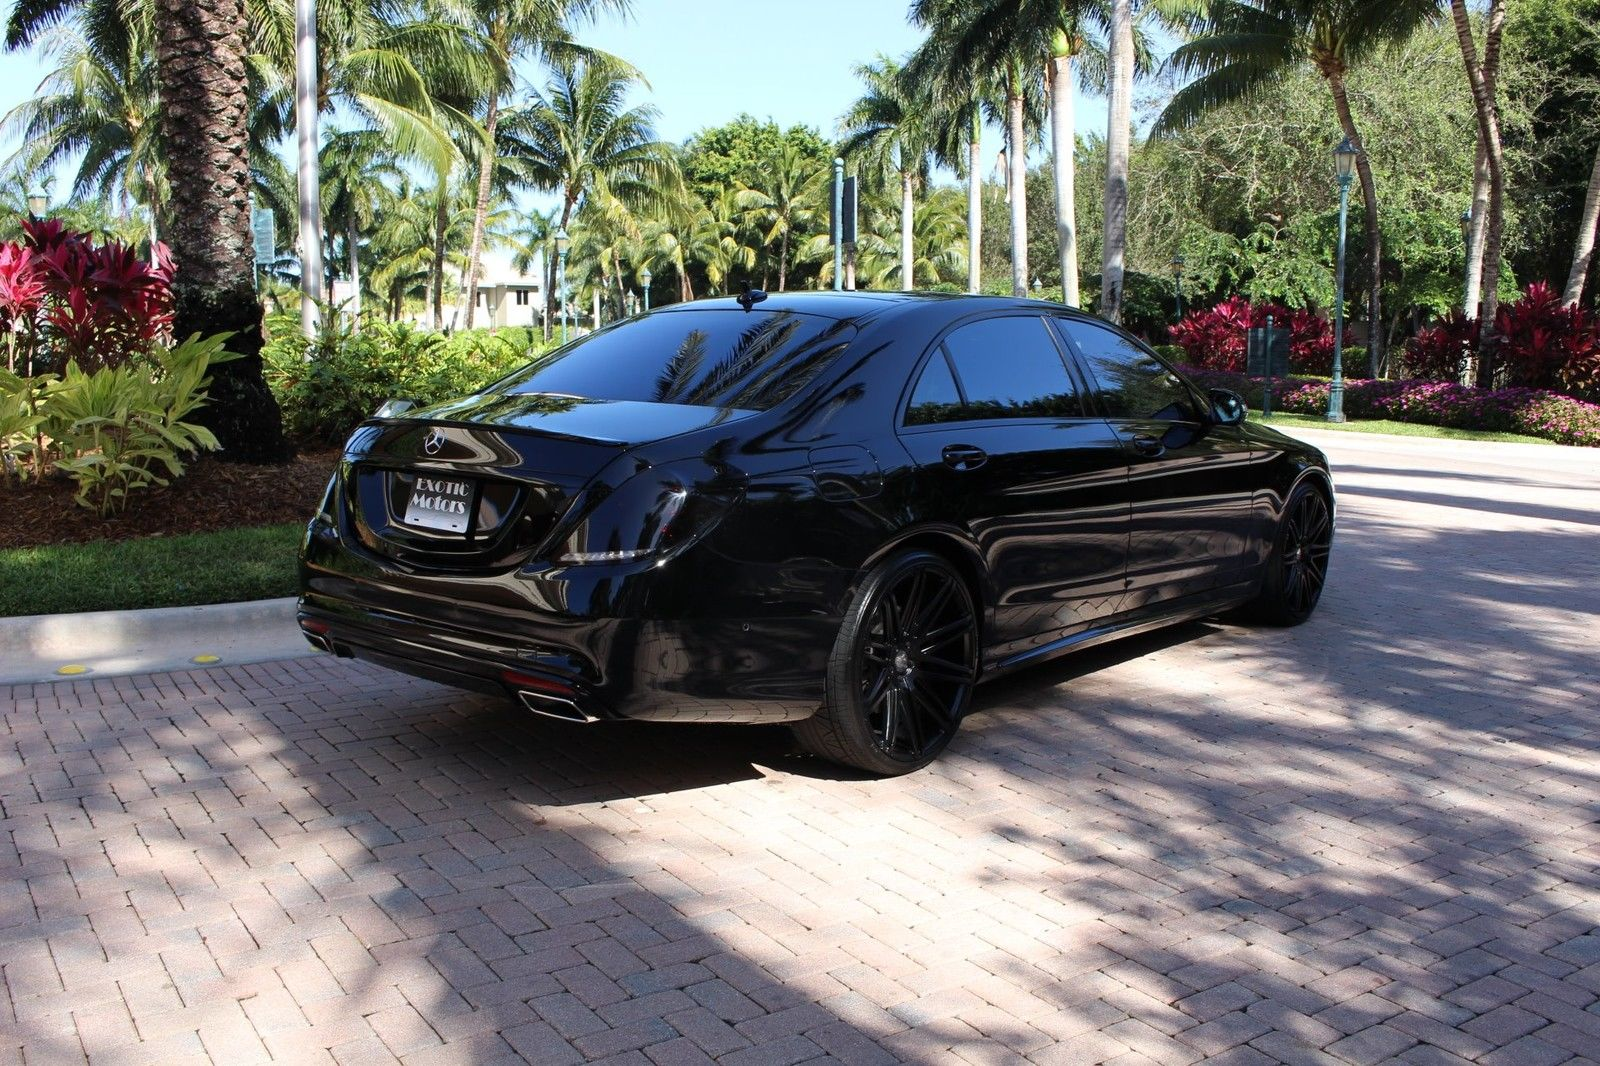 2016 mercedes benz w222 s550 all black benztuning for Mercedes benz all